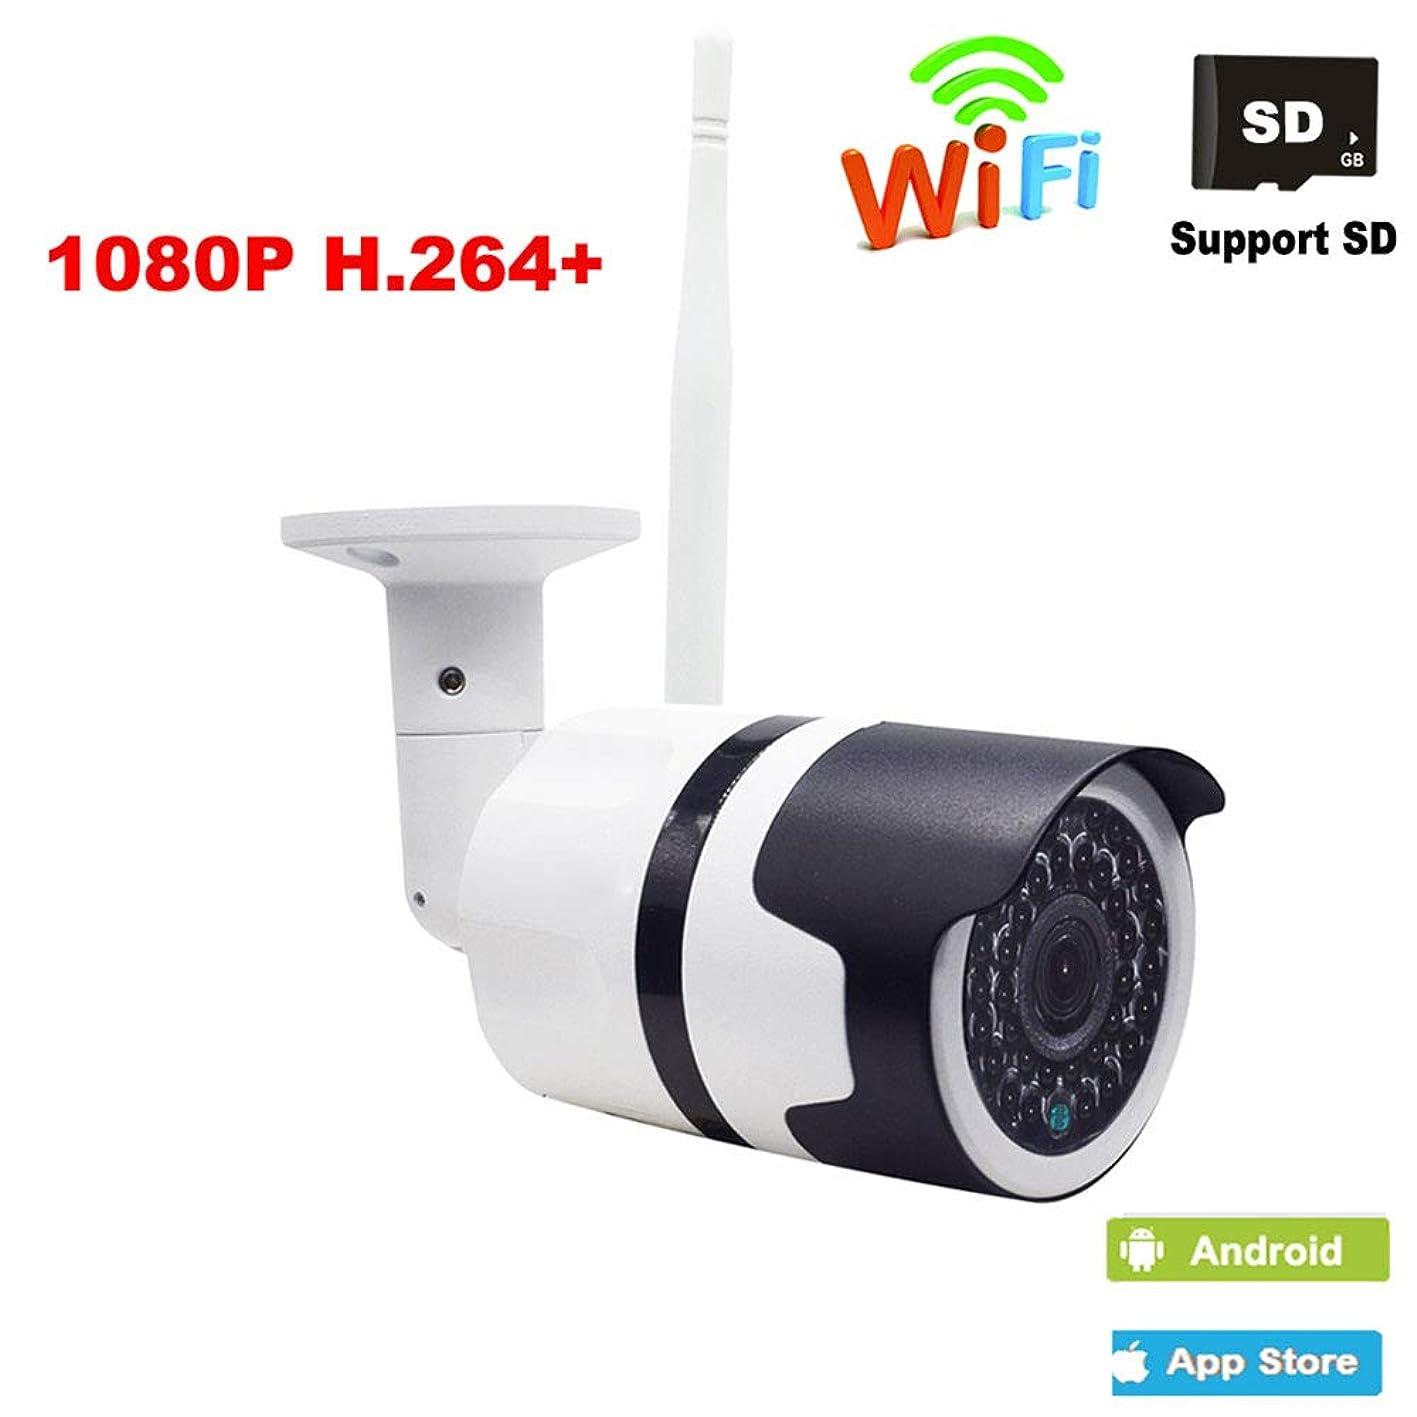 QOUP WiFi IP Camera, Wireless Indoor Camera Night Vision Motion Detection Monitoring PTZ Monitoring Two-Way Voice, Monitoring System Baby/pet/Nanny Monitor okfdljfatkf774